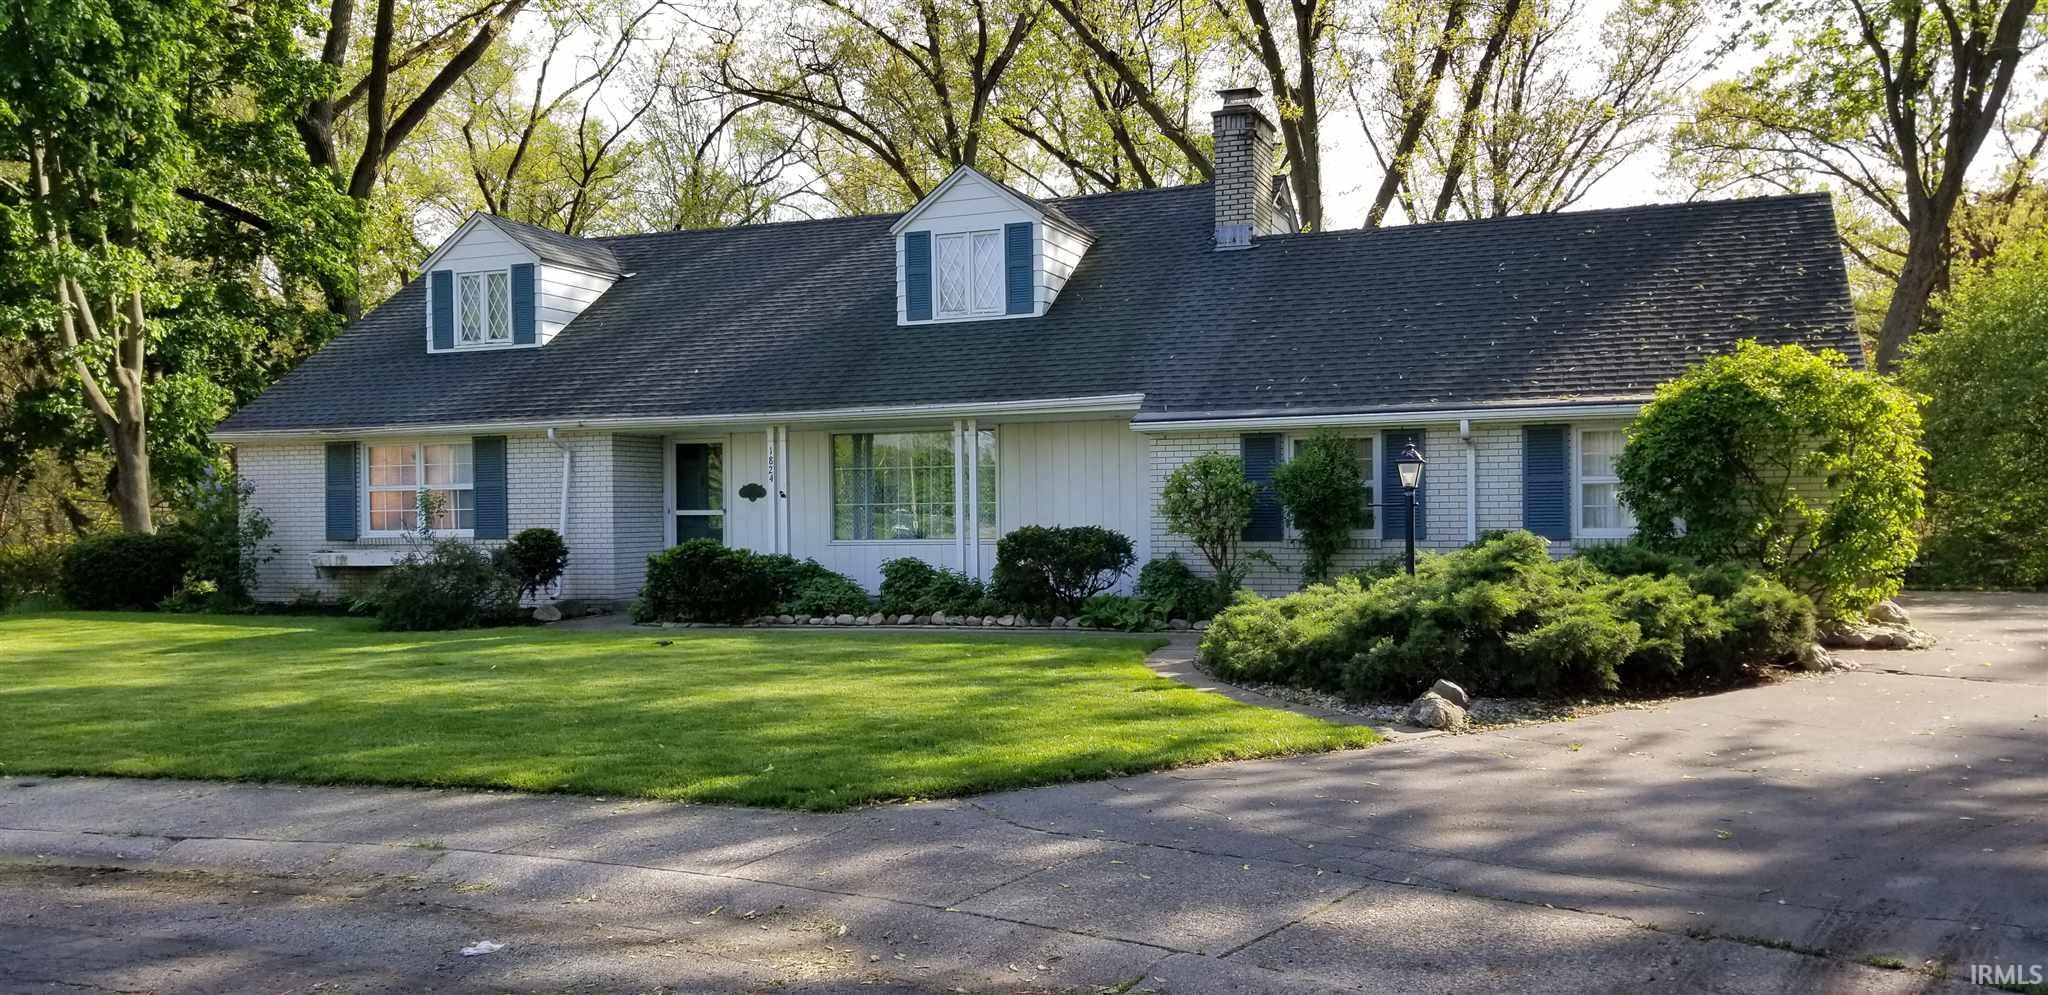 1824 Ridgewood South Bend, IN 46617